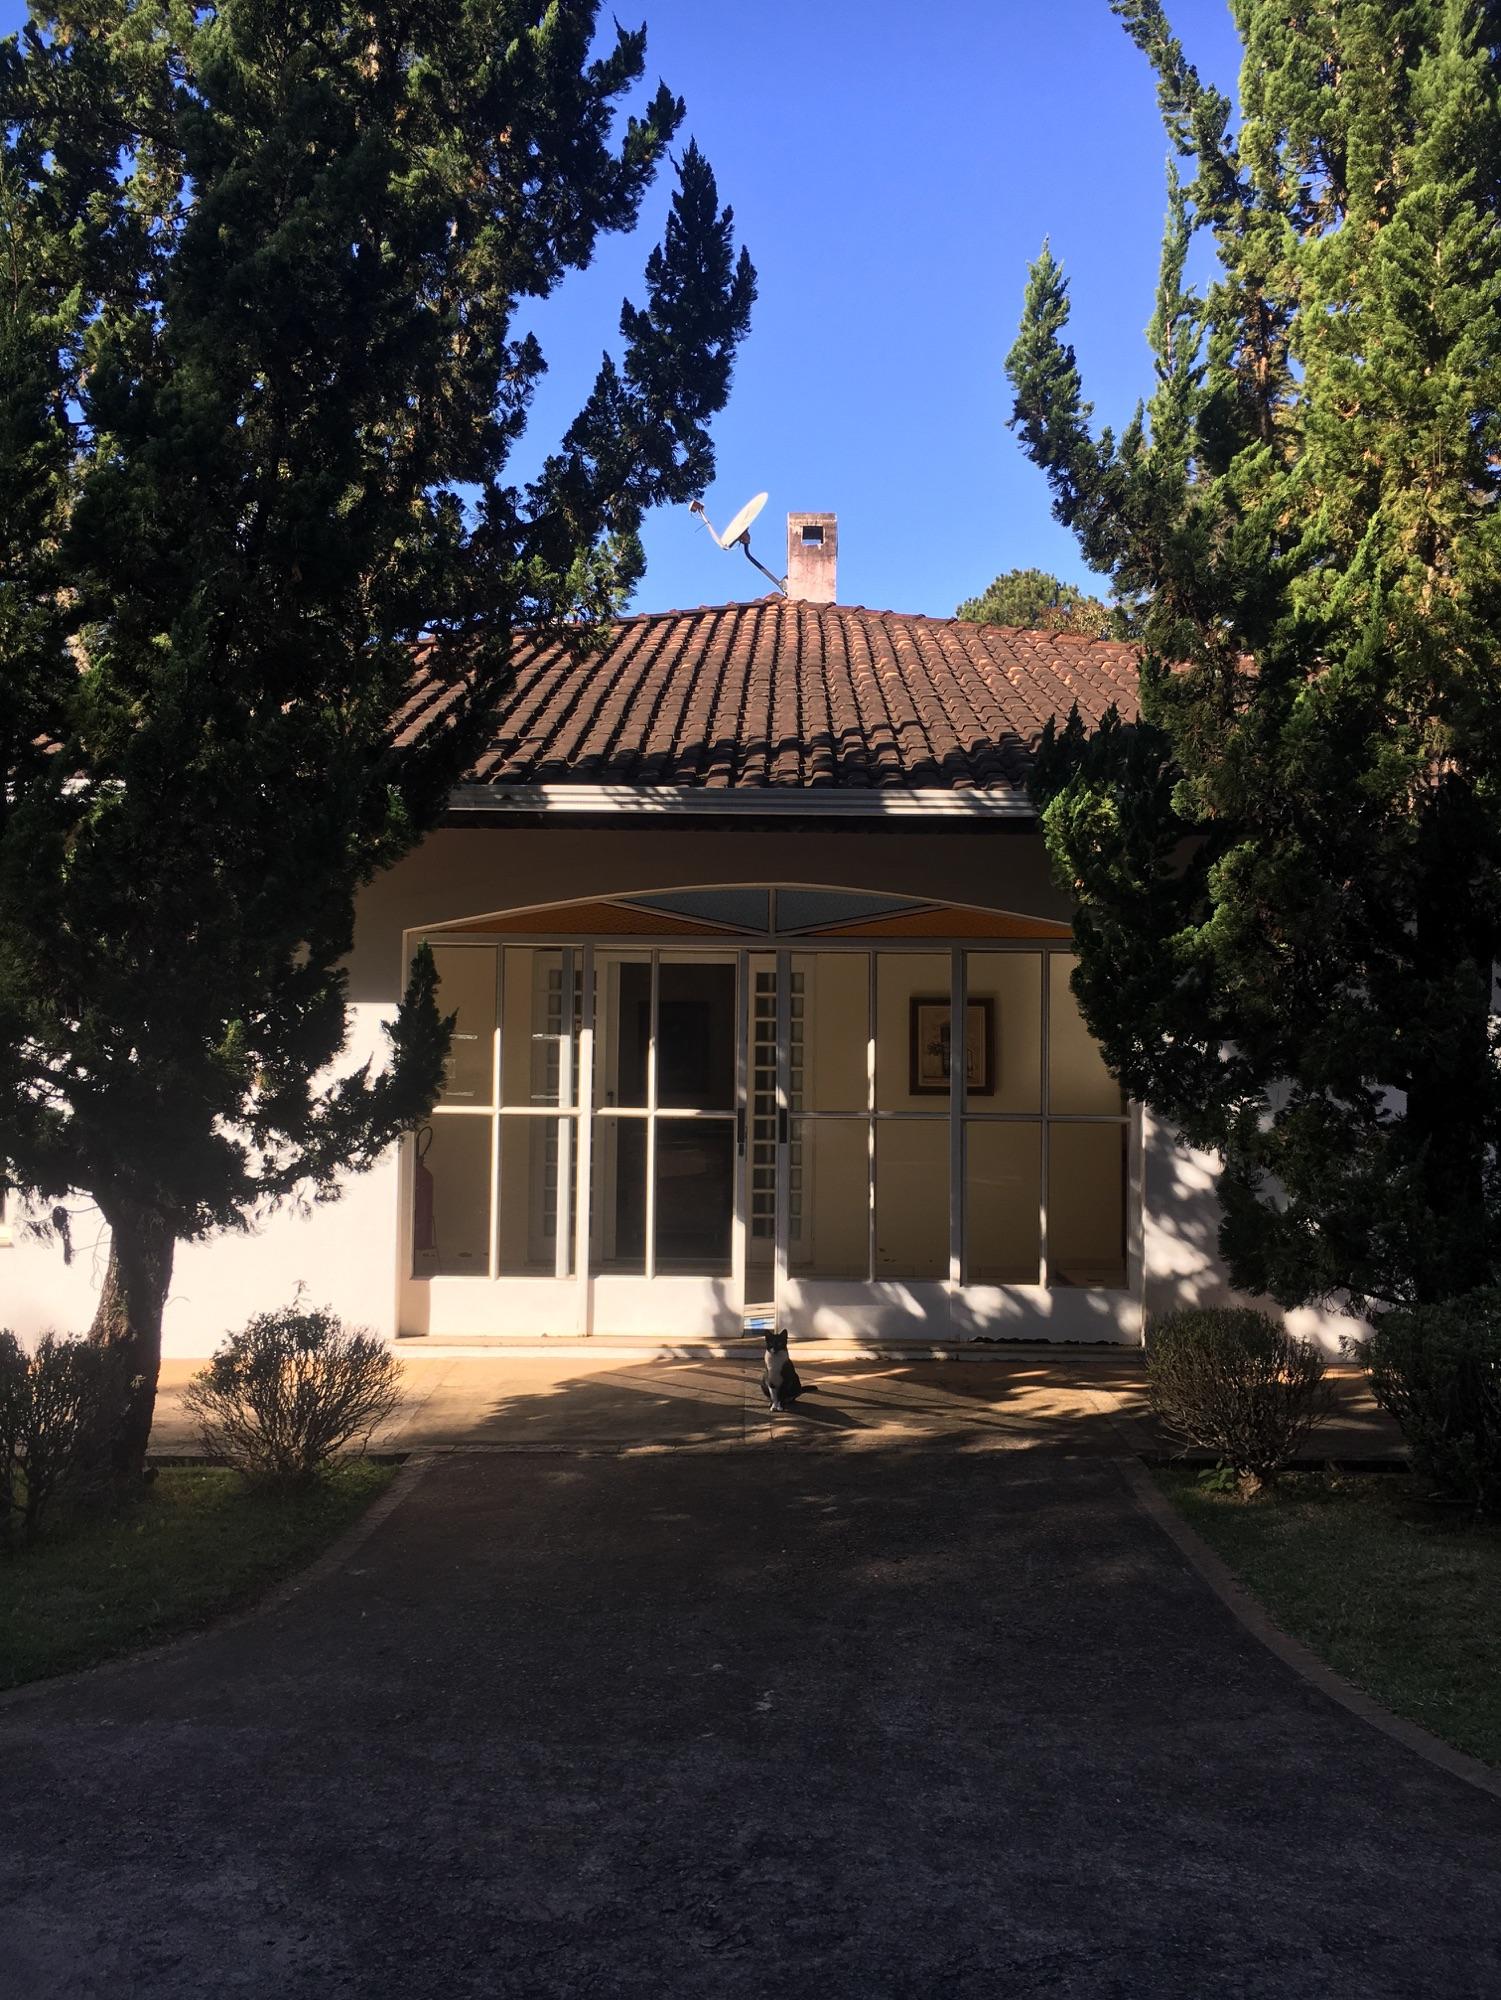 Amora at the entrance to the pousada.